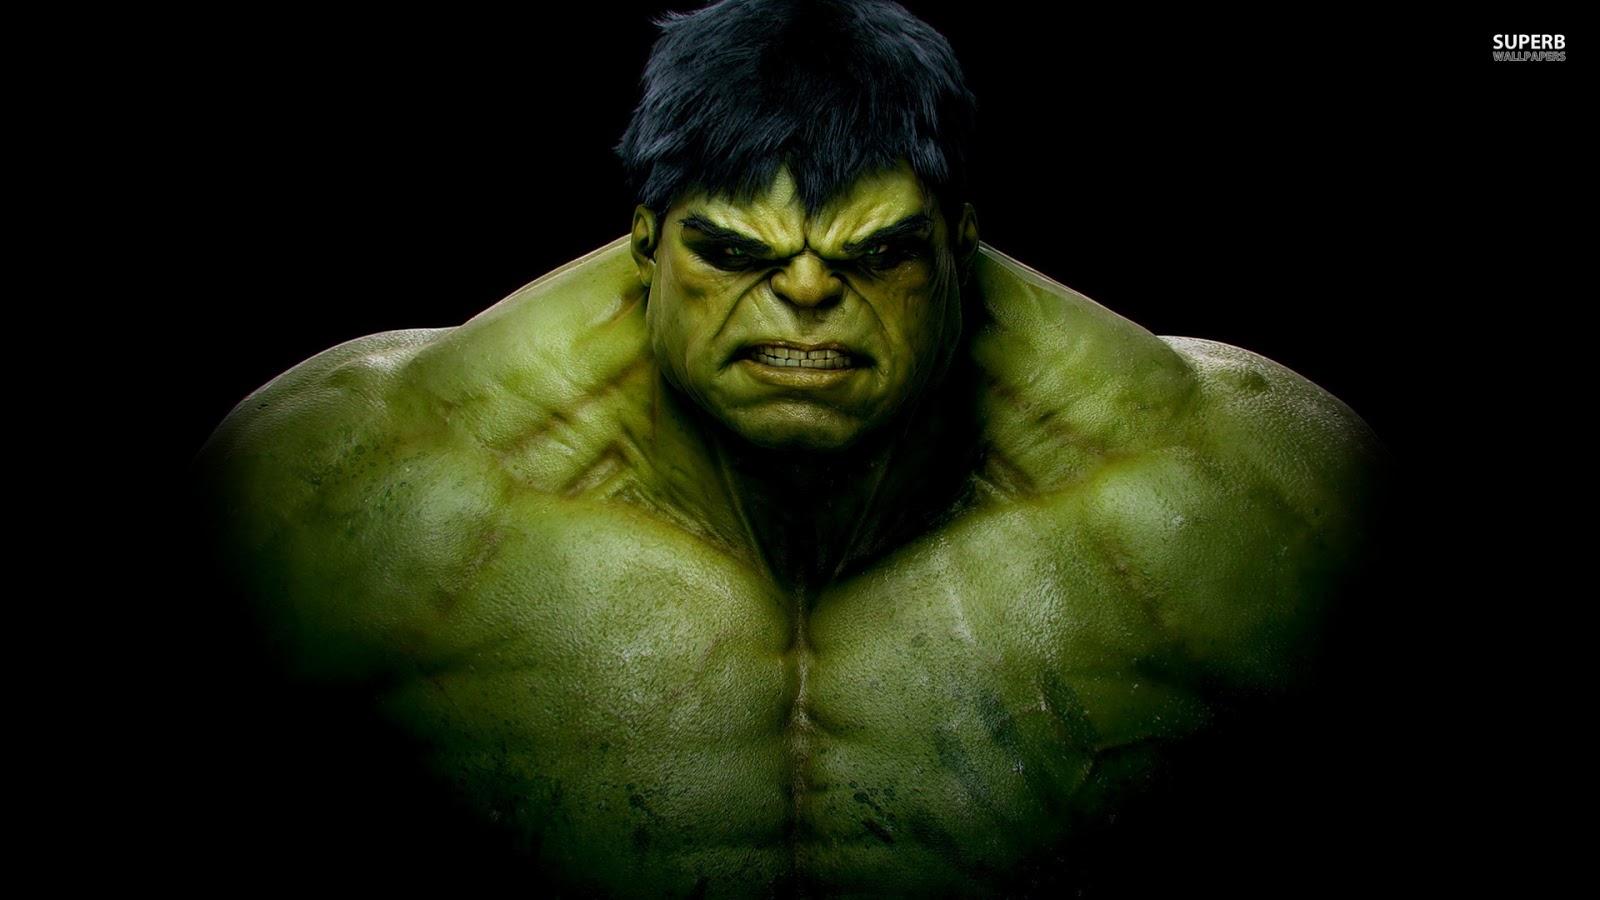 angry hulk throwing rocks - photo #29